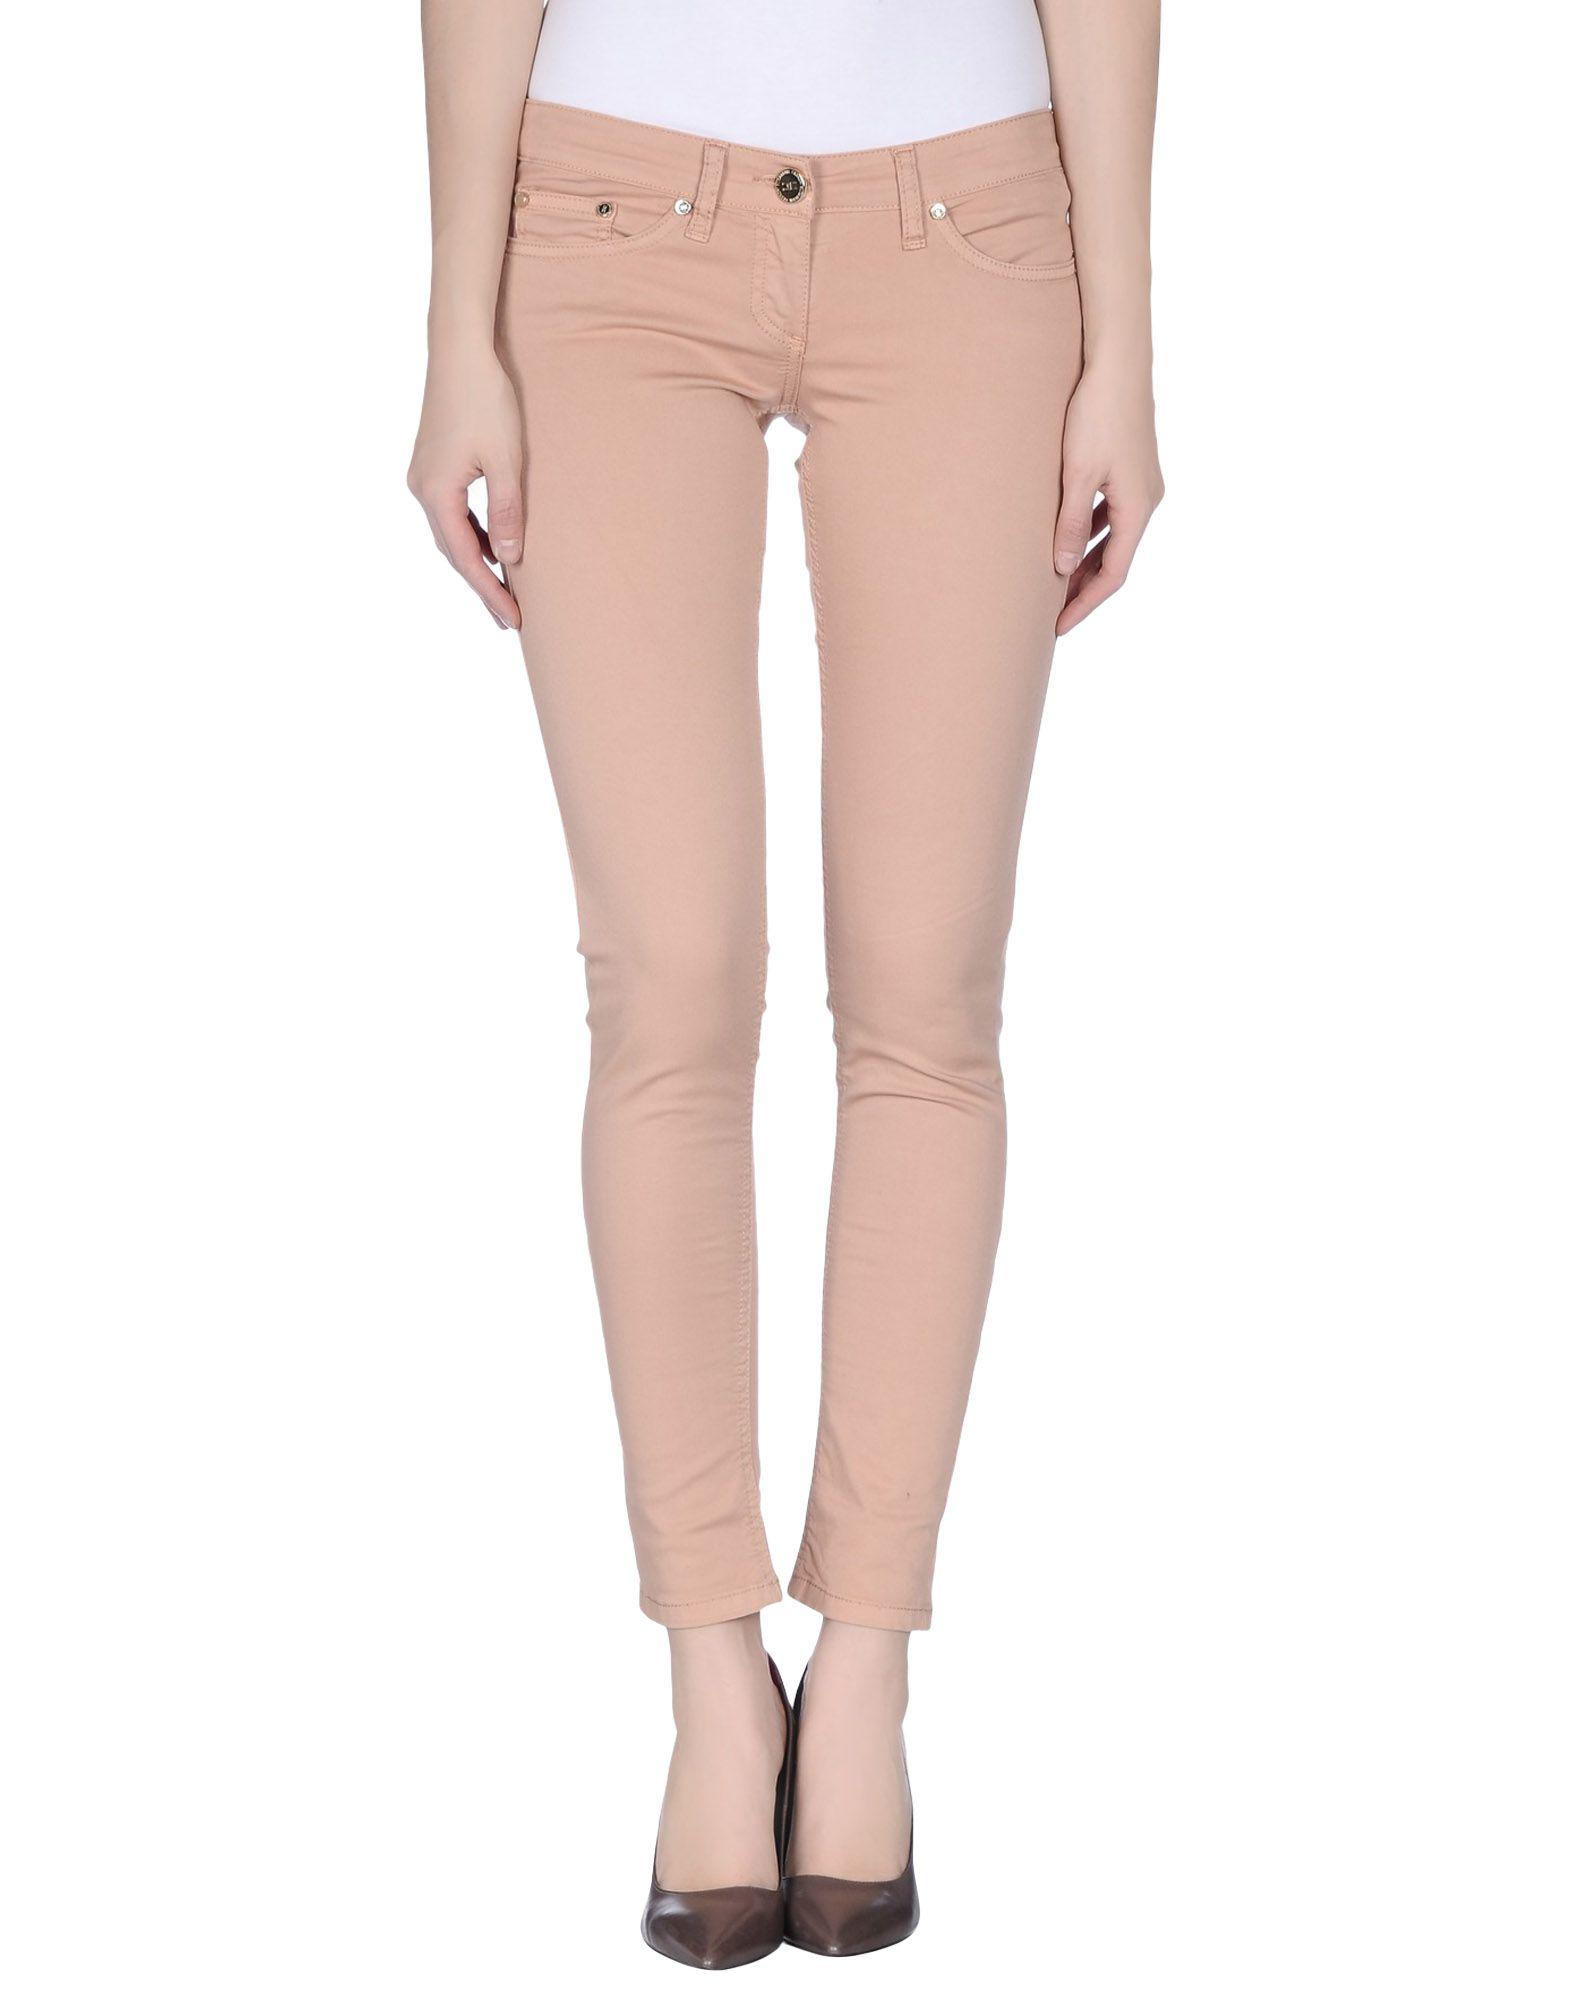 Elisabetta franchi Casual Trouser in Khaki (Skin colour) | Lyst